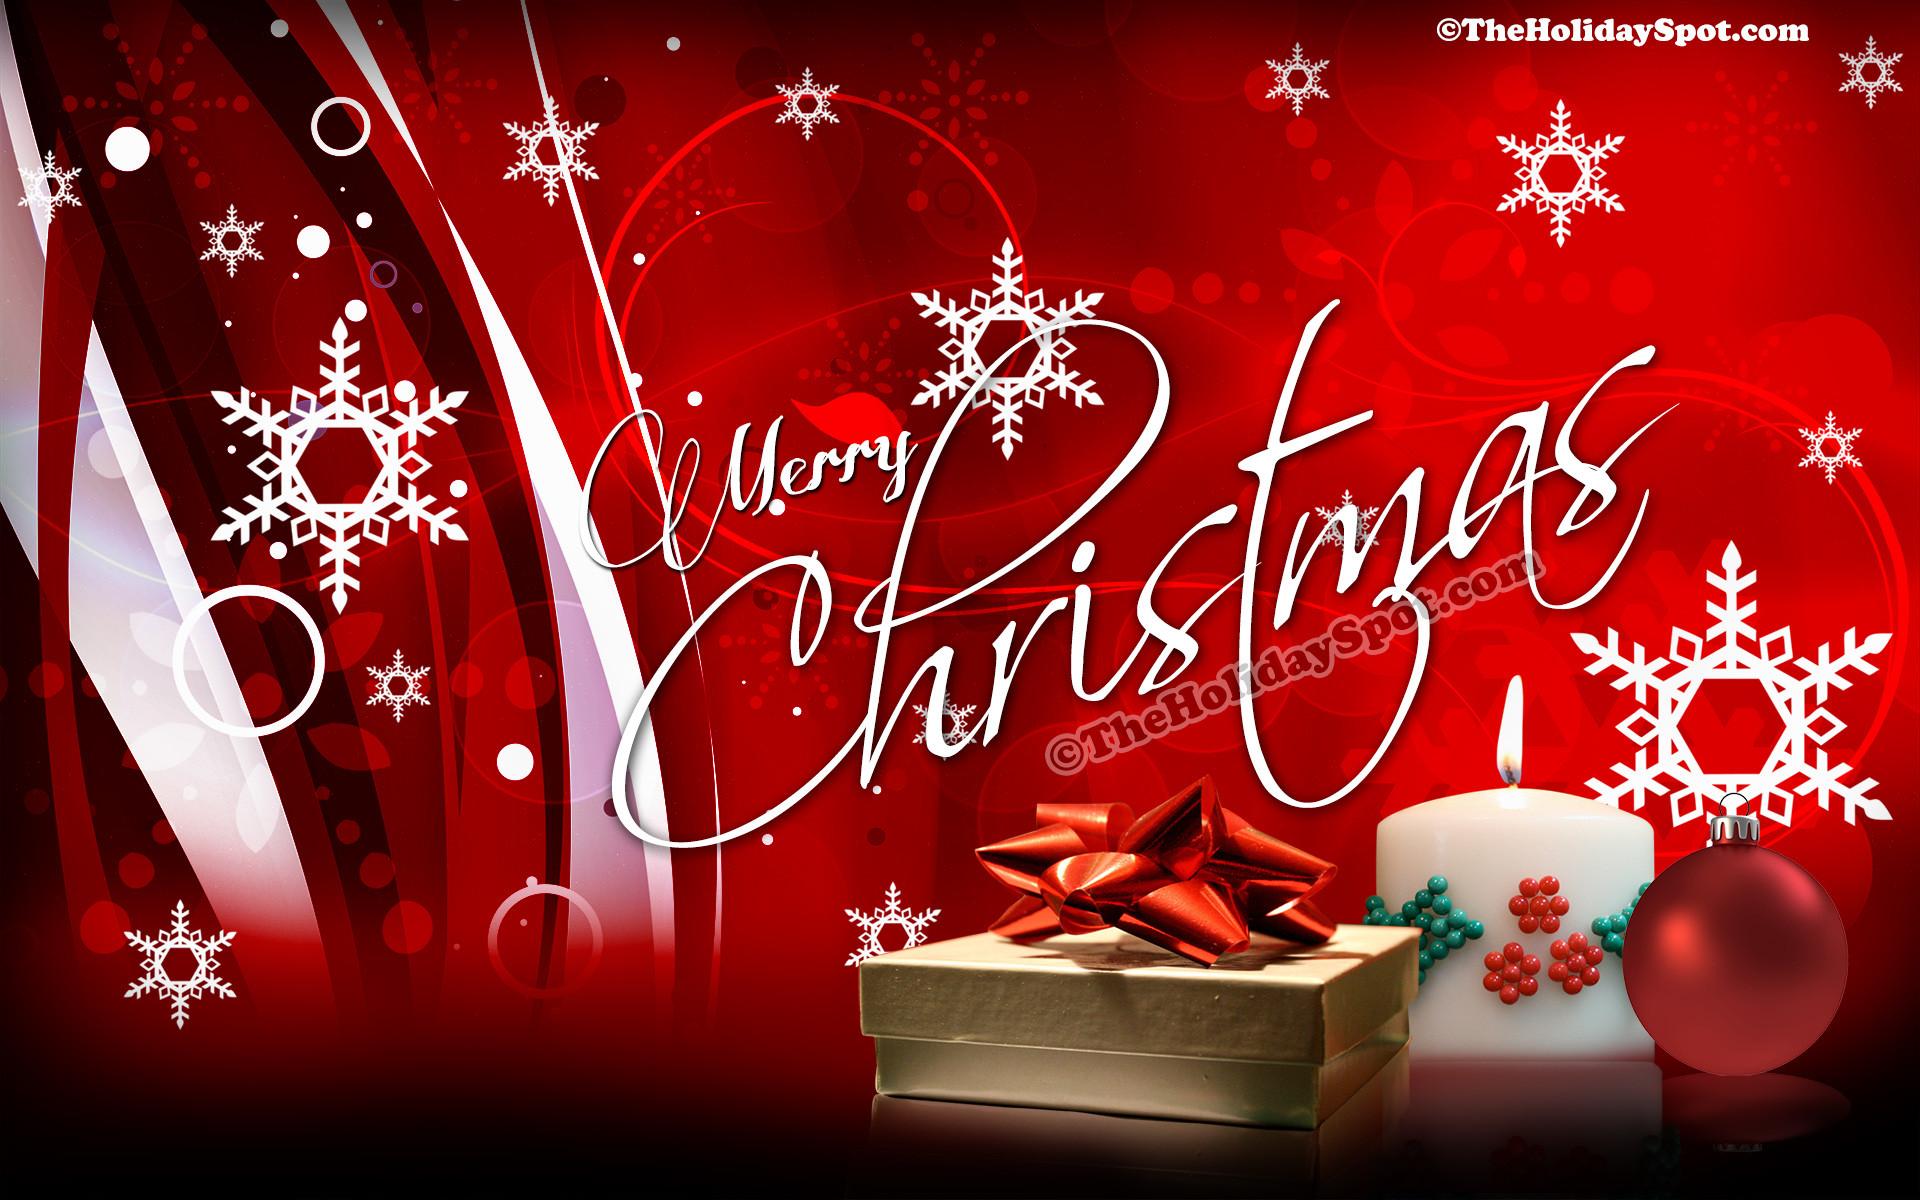 HD Christmas Desktop Illustration